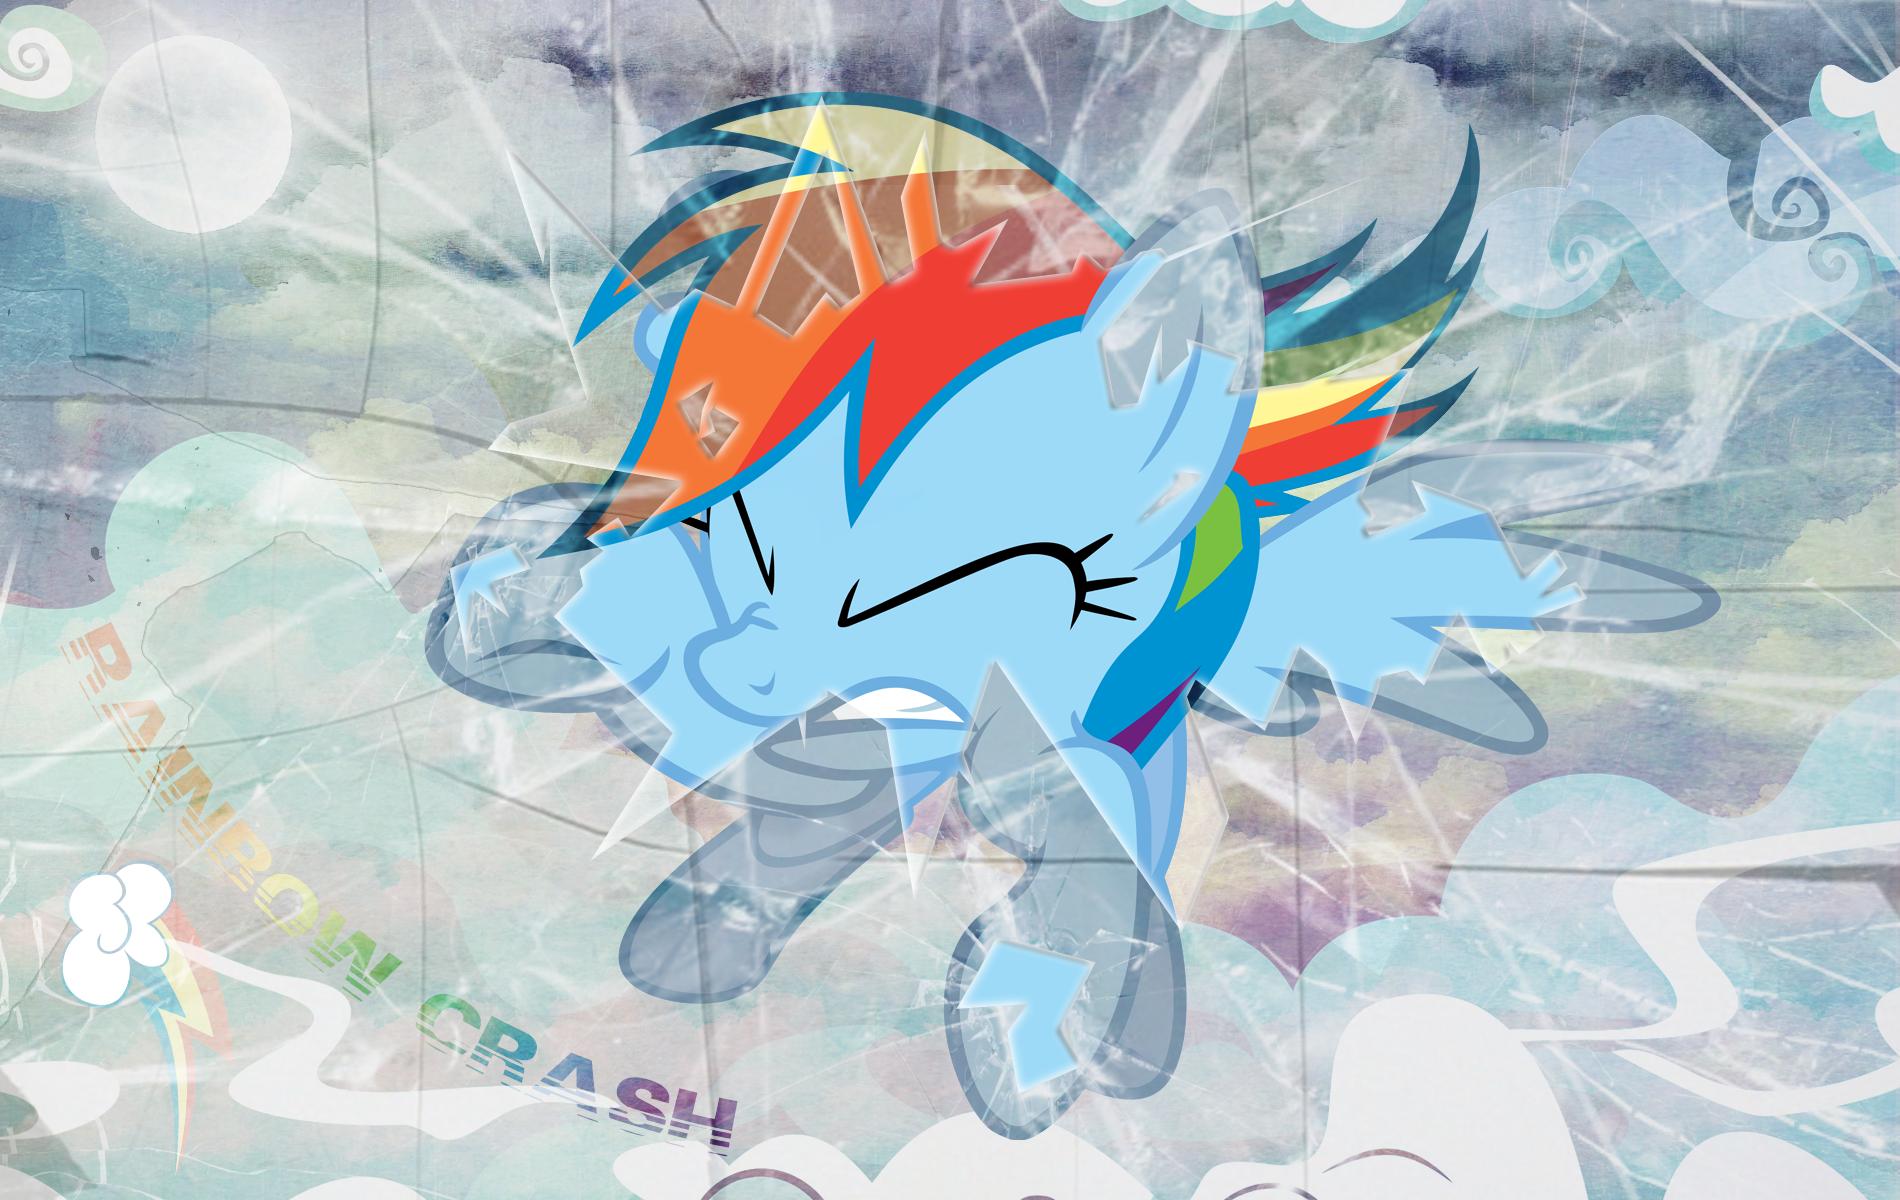 Rainbow Crash In Your Screen Wallpaper by MLArtSpecter 1900x1200